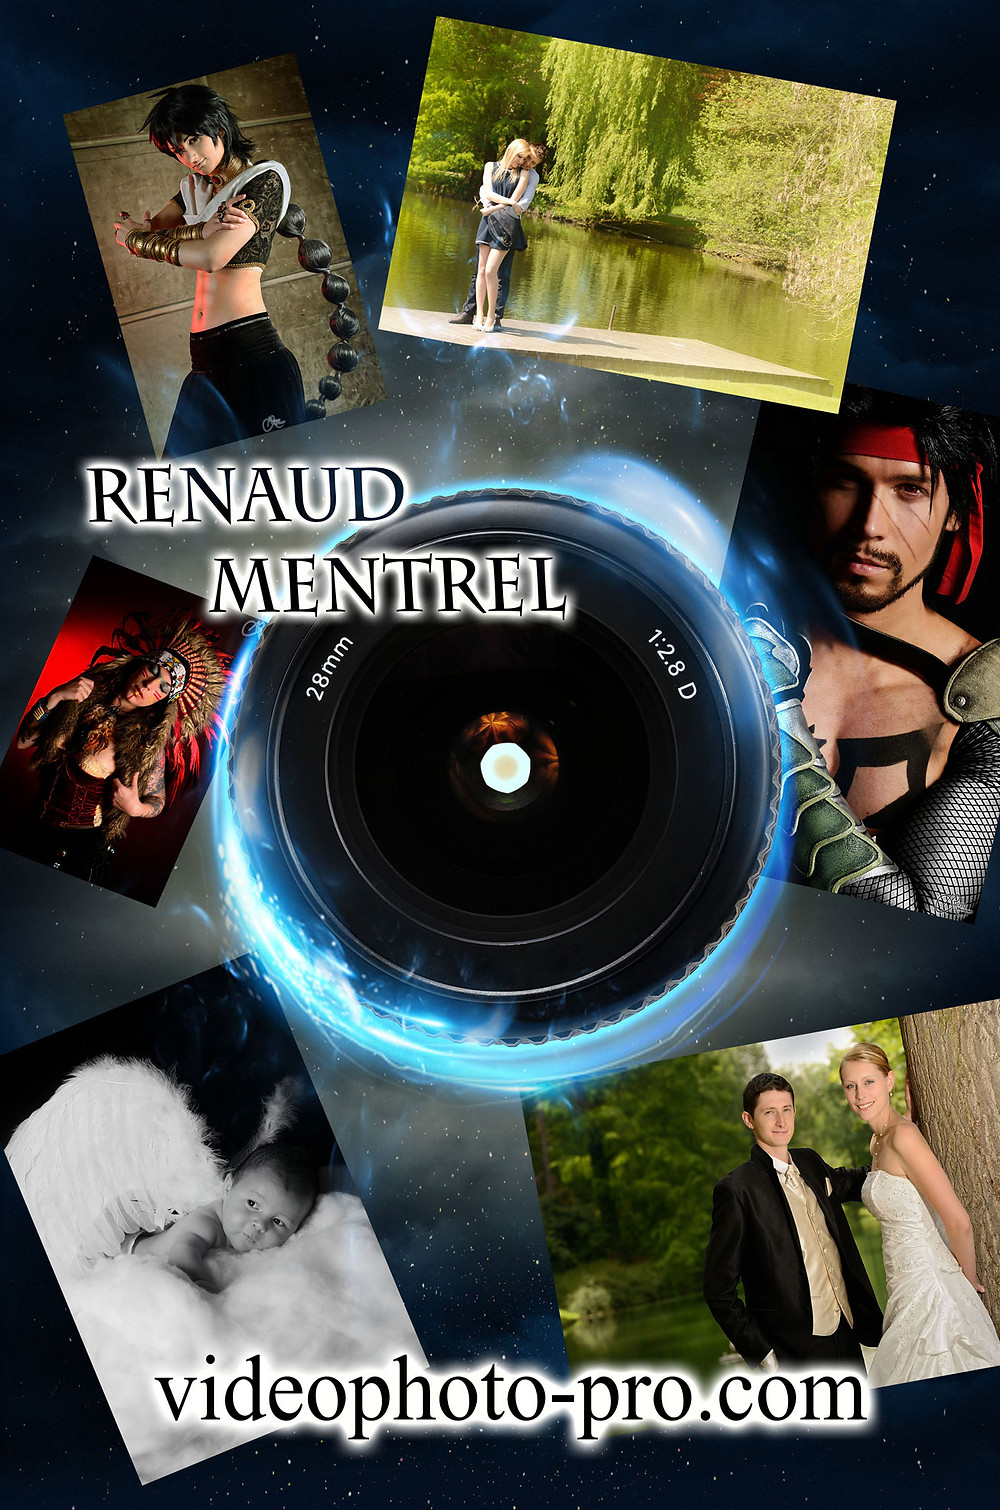 videophoto-pro.com-renaud mentrel-photographe